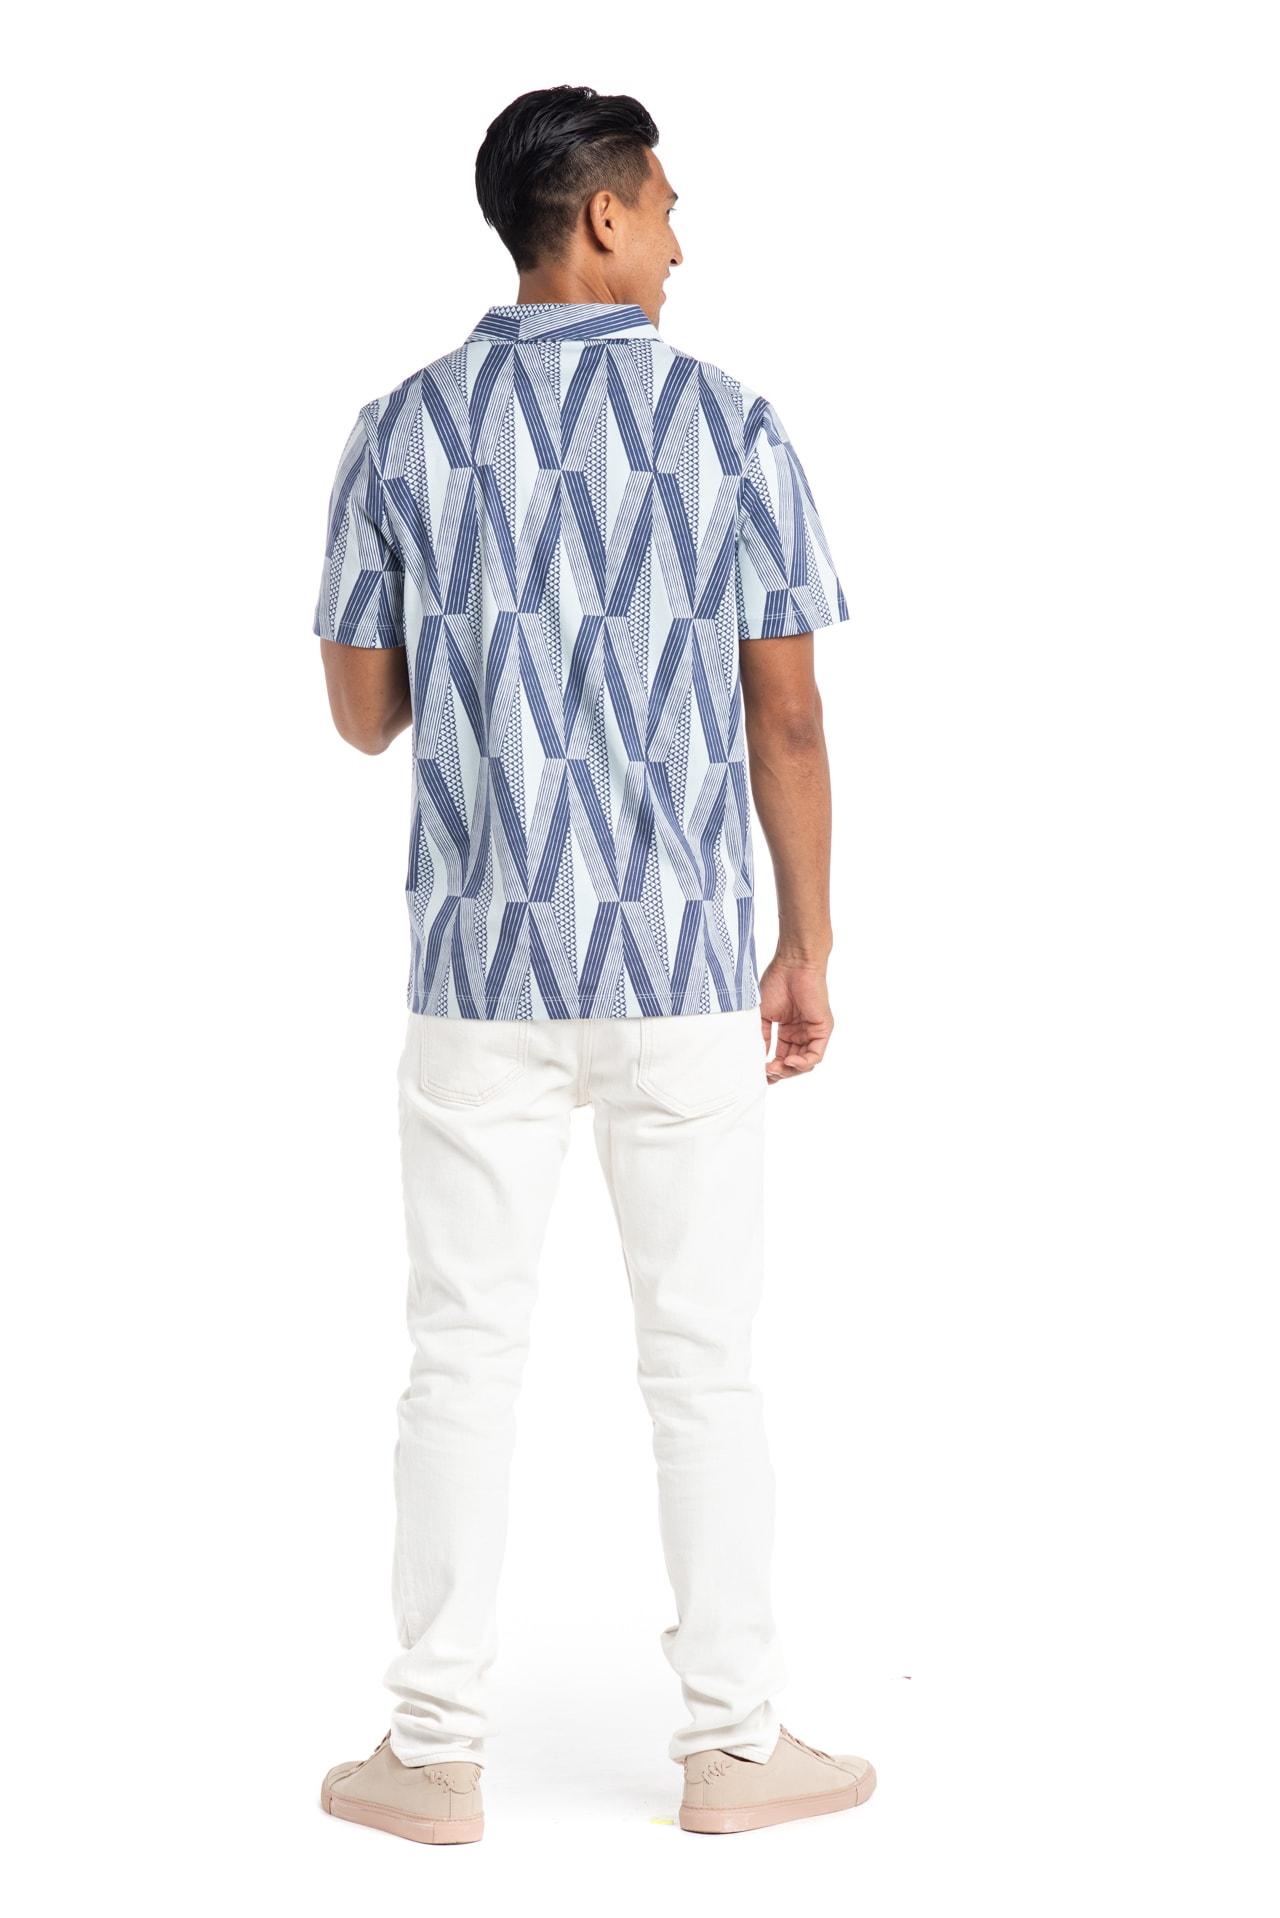 Male model wearing Waikii Polo in Kanaloa - Back View